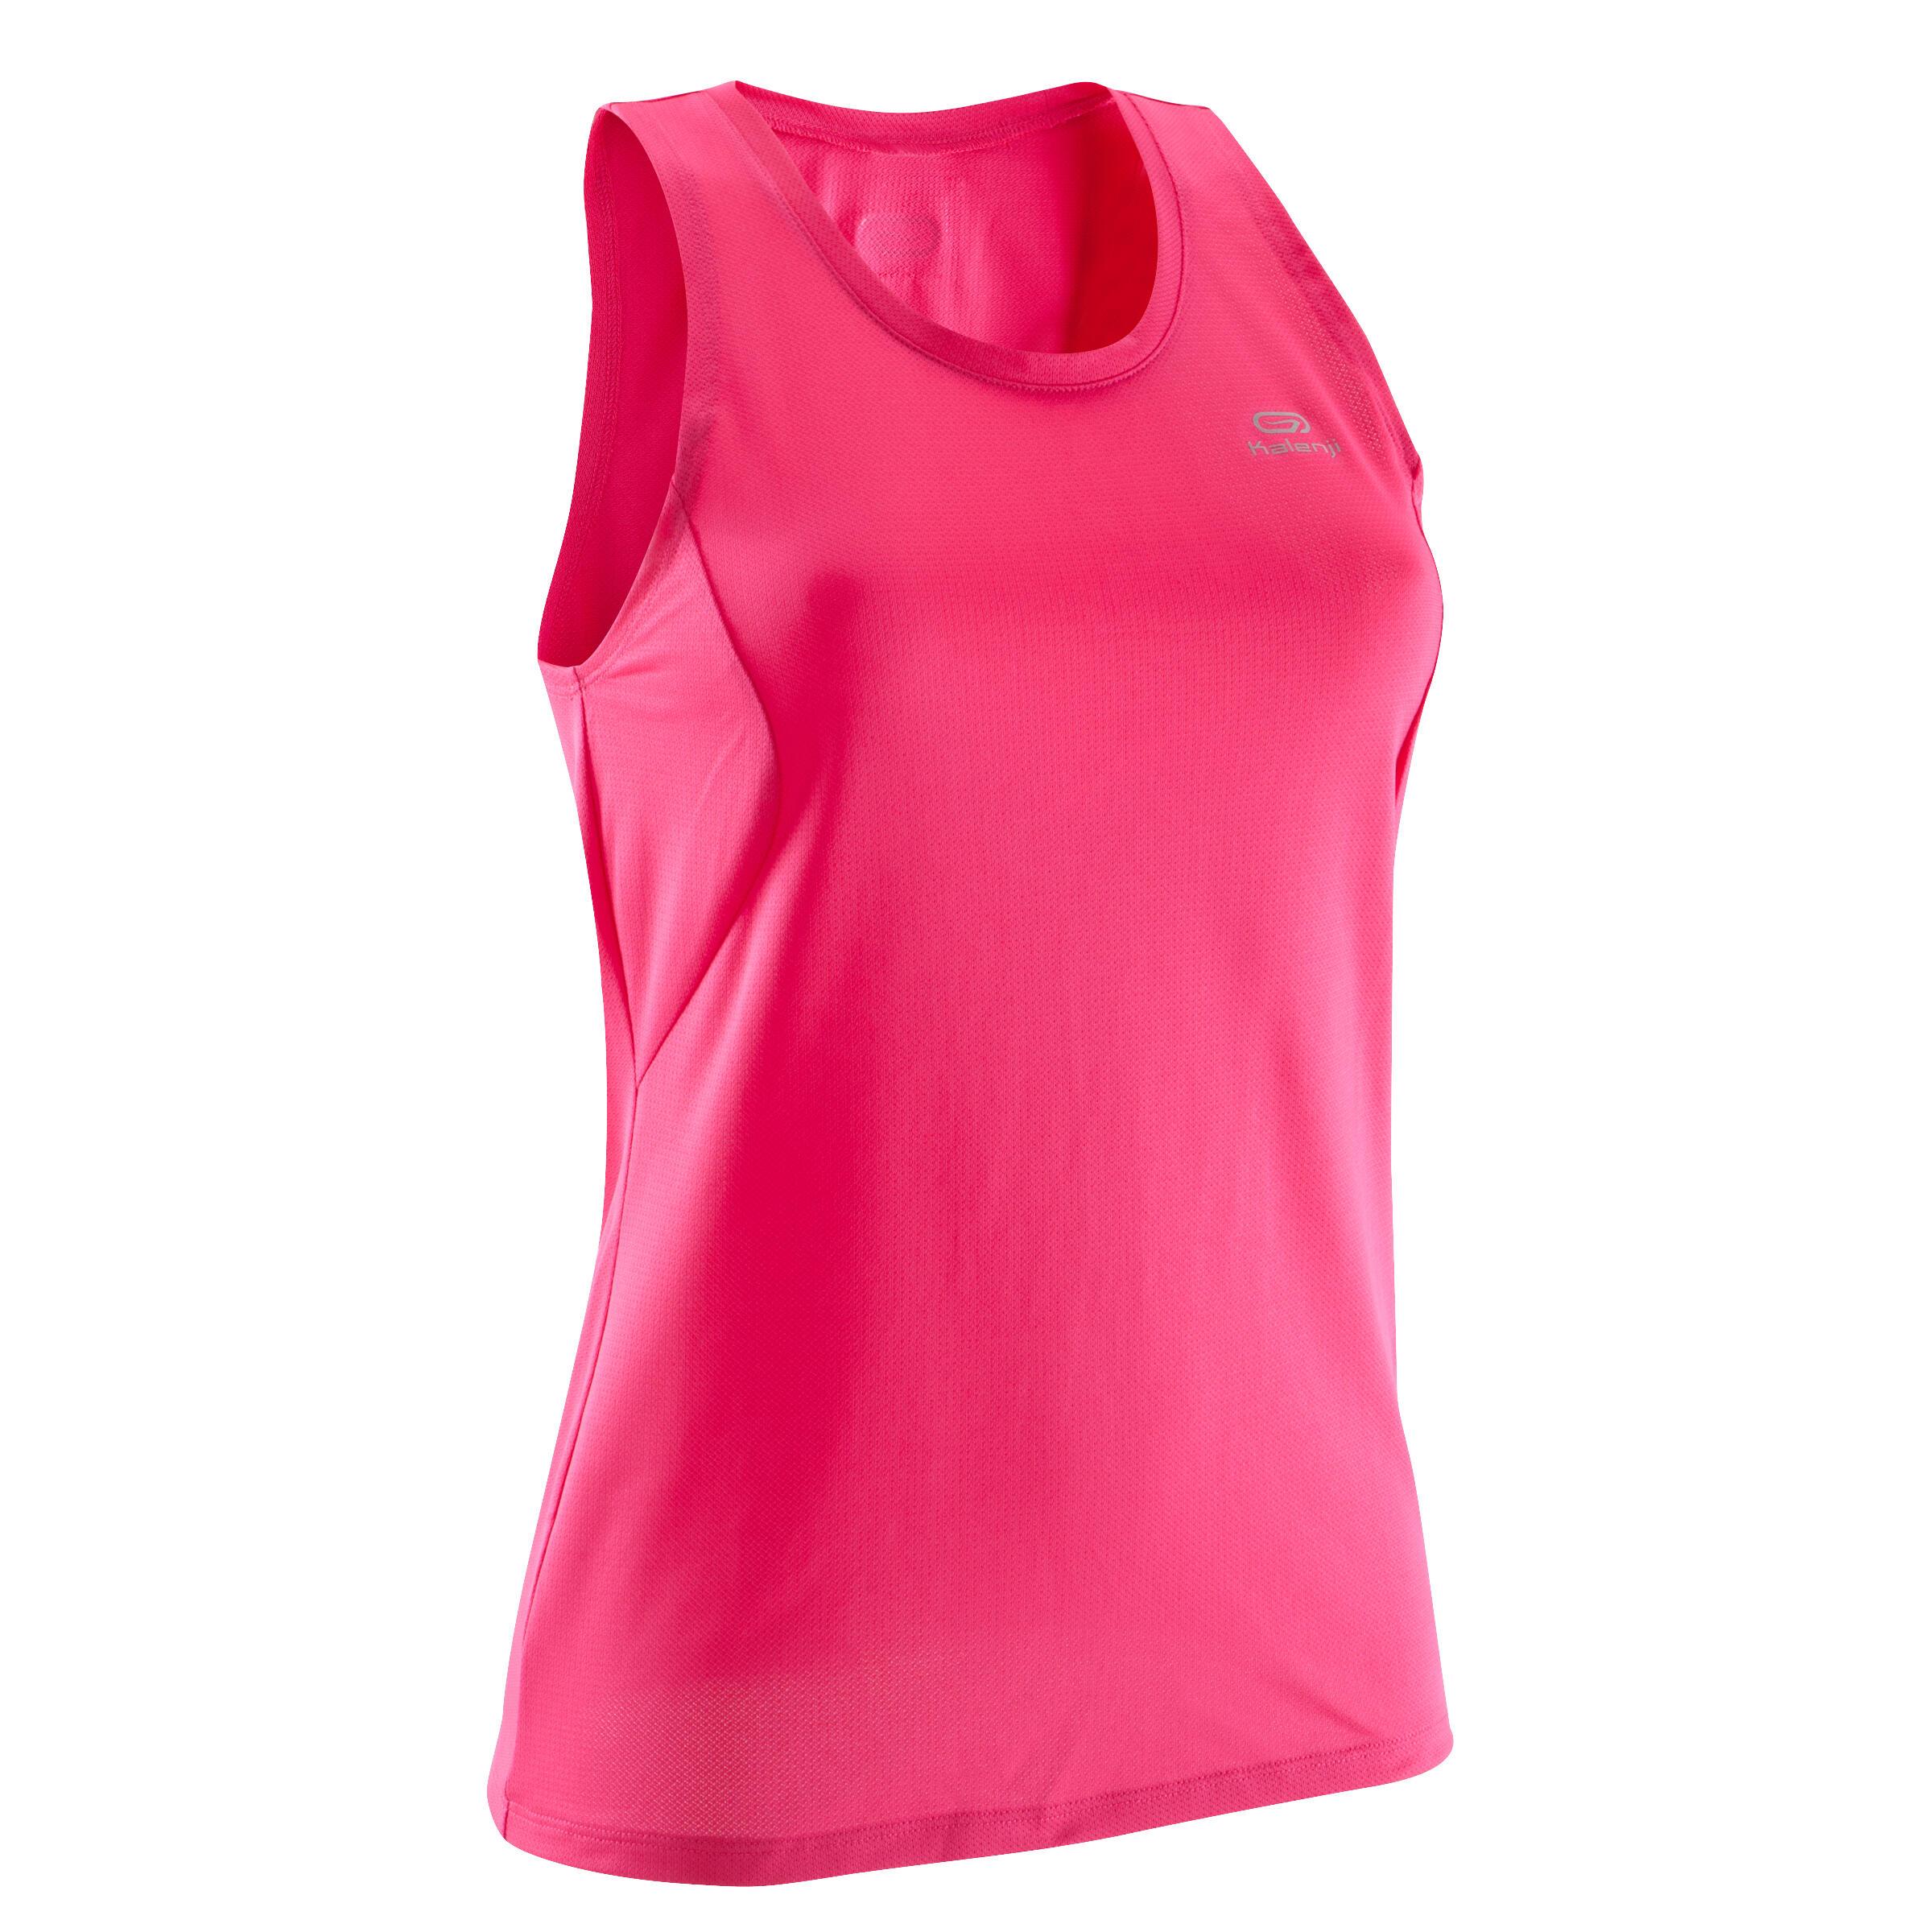 Lauftop Run Dry Damen pink   Sportbekleidung > Sporttops > Lauftops   Rosa   Baumwolle - Ab   Kalenji